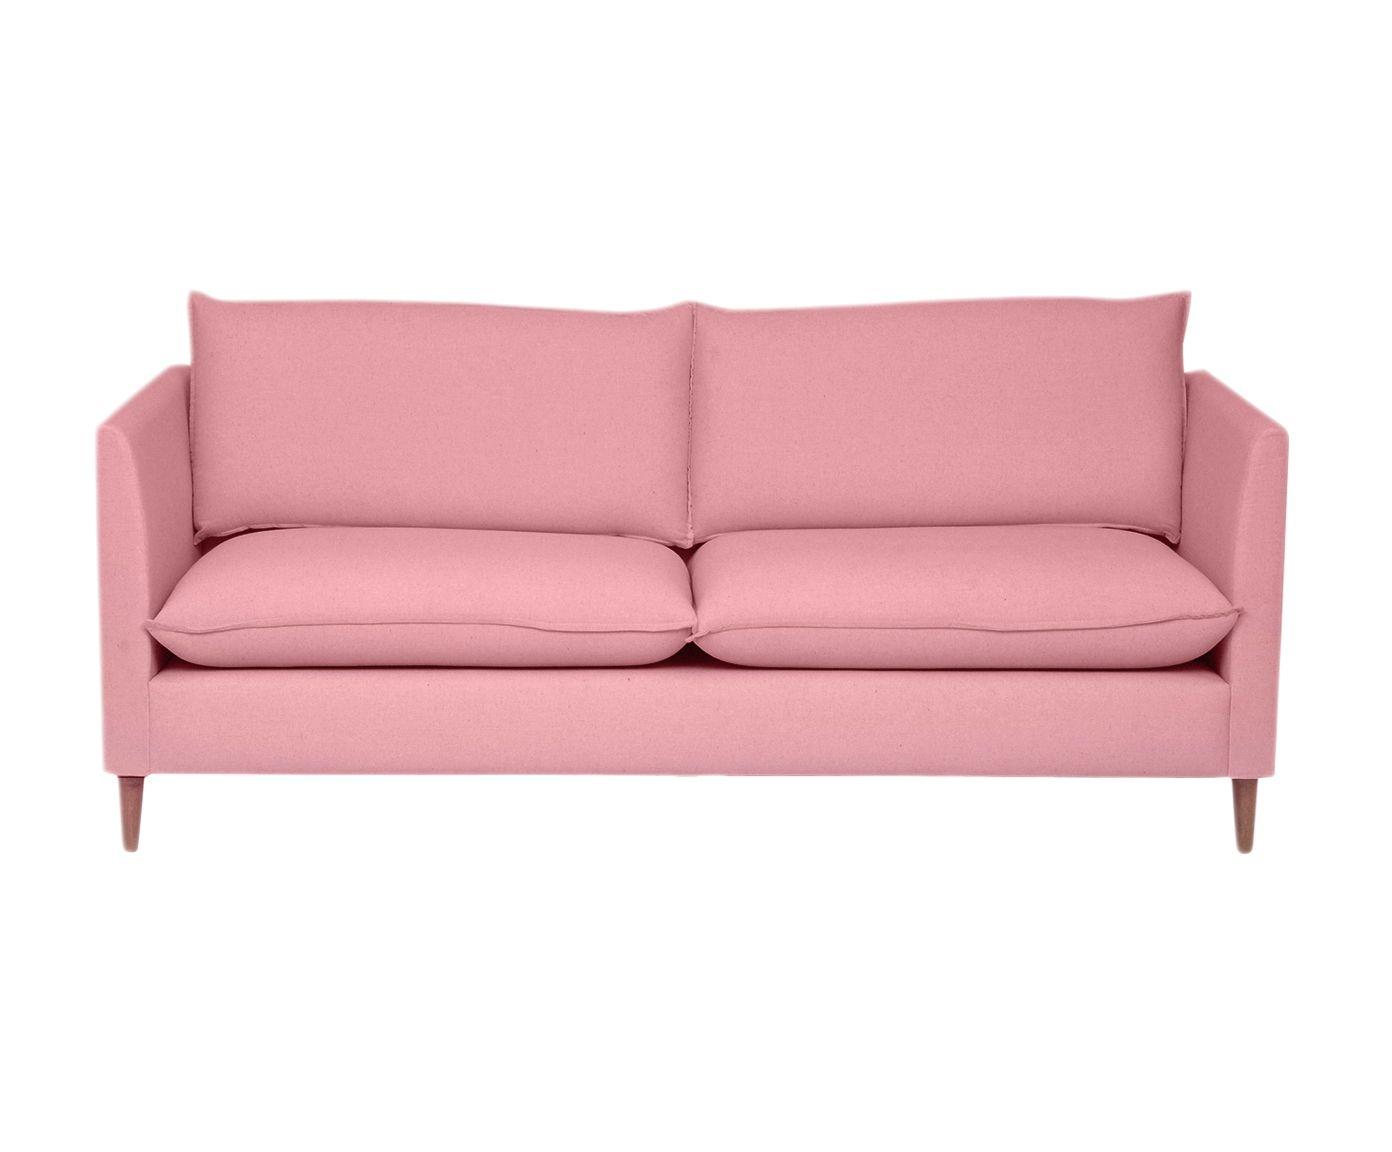 Sofá Nina Rosa Flamingo - 180X84X82cm   Westwing.com.br